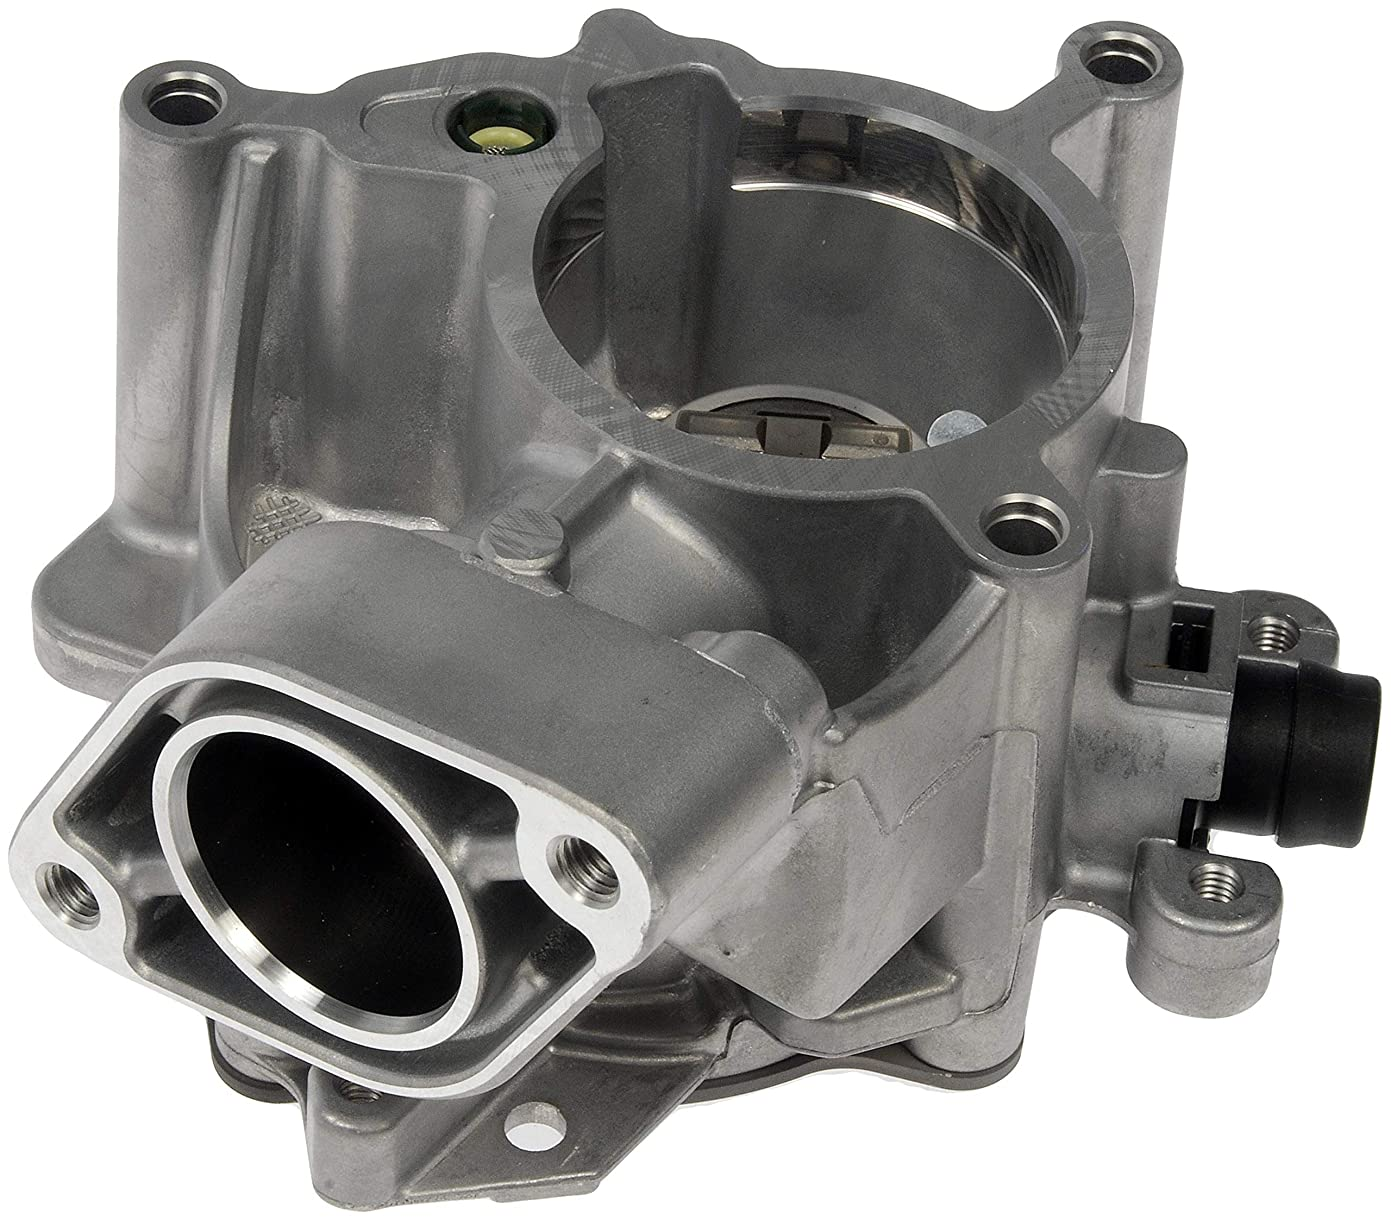 Dorman 904-835 Mechanical Vacuum Pump for Select Volkswagen Golf / Beetle Models mh10562141